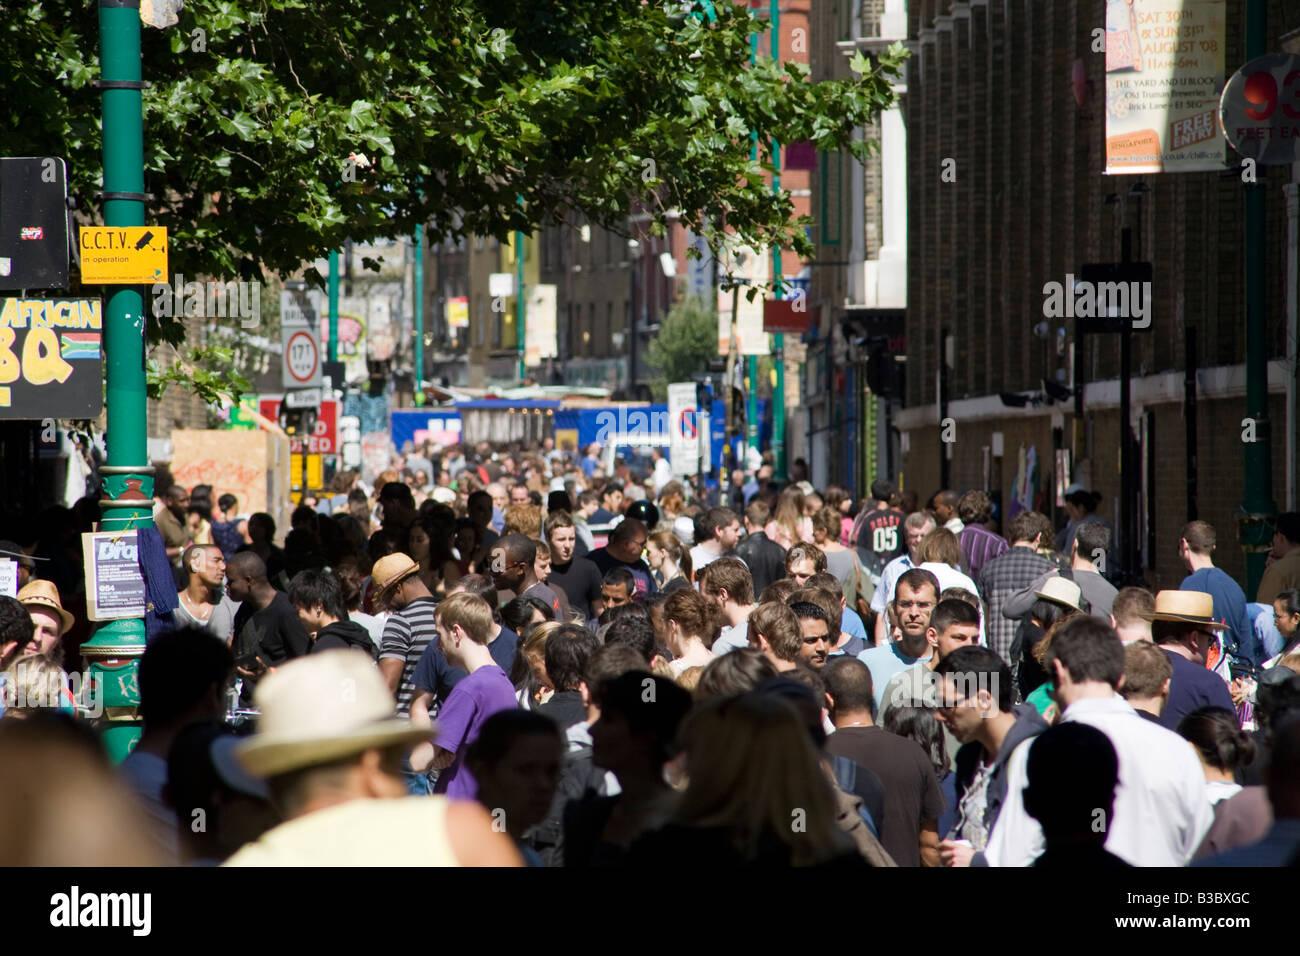 Crowd in Brick Lane Market. Shoreditch, London, England - Stock Image